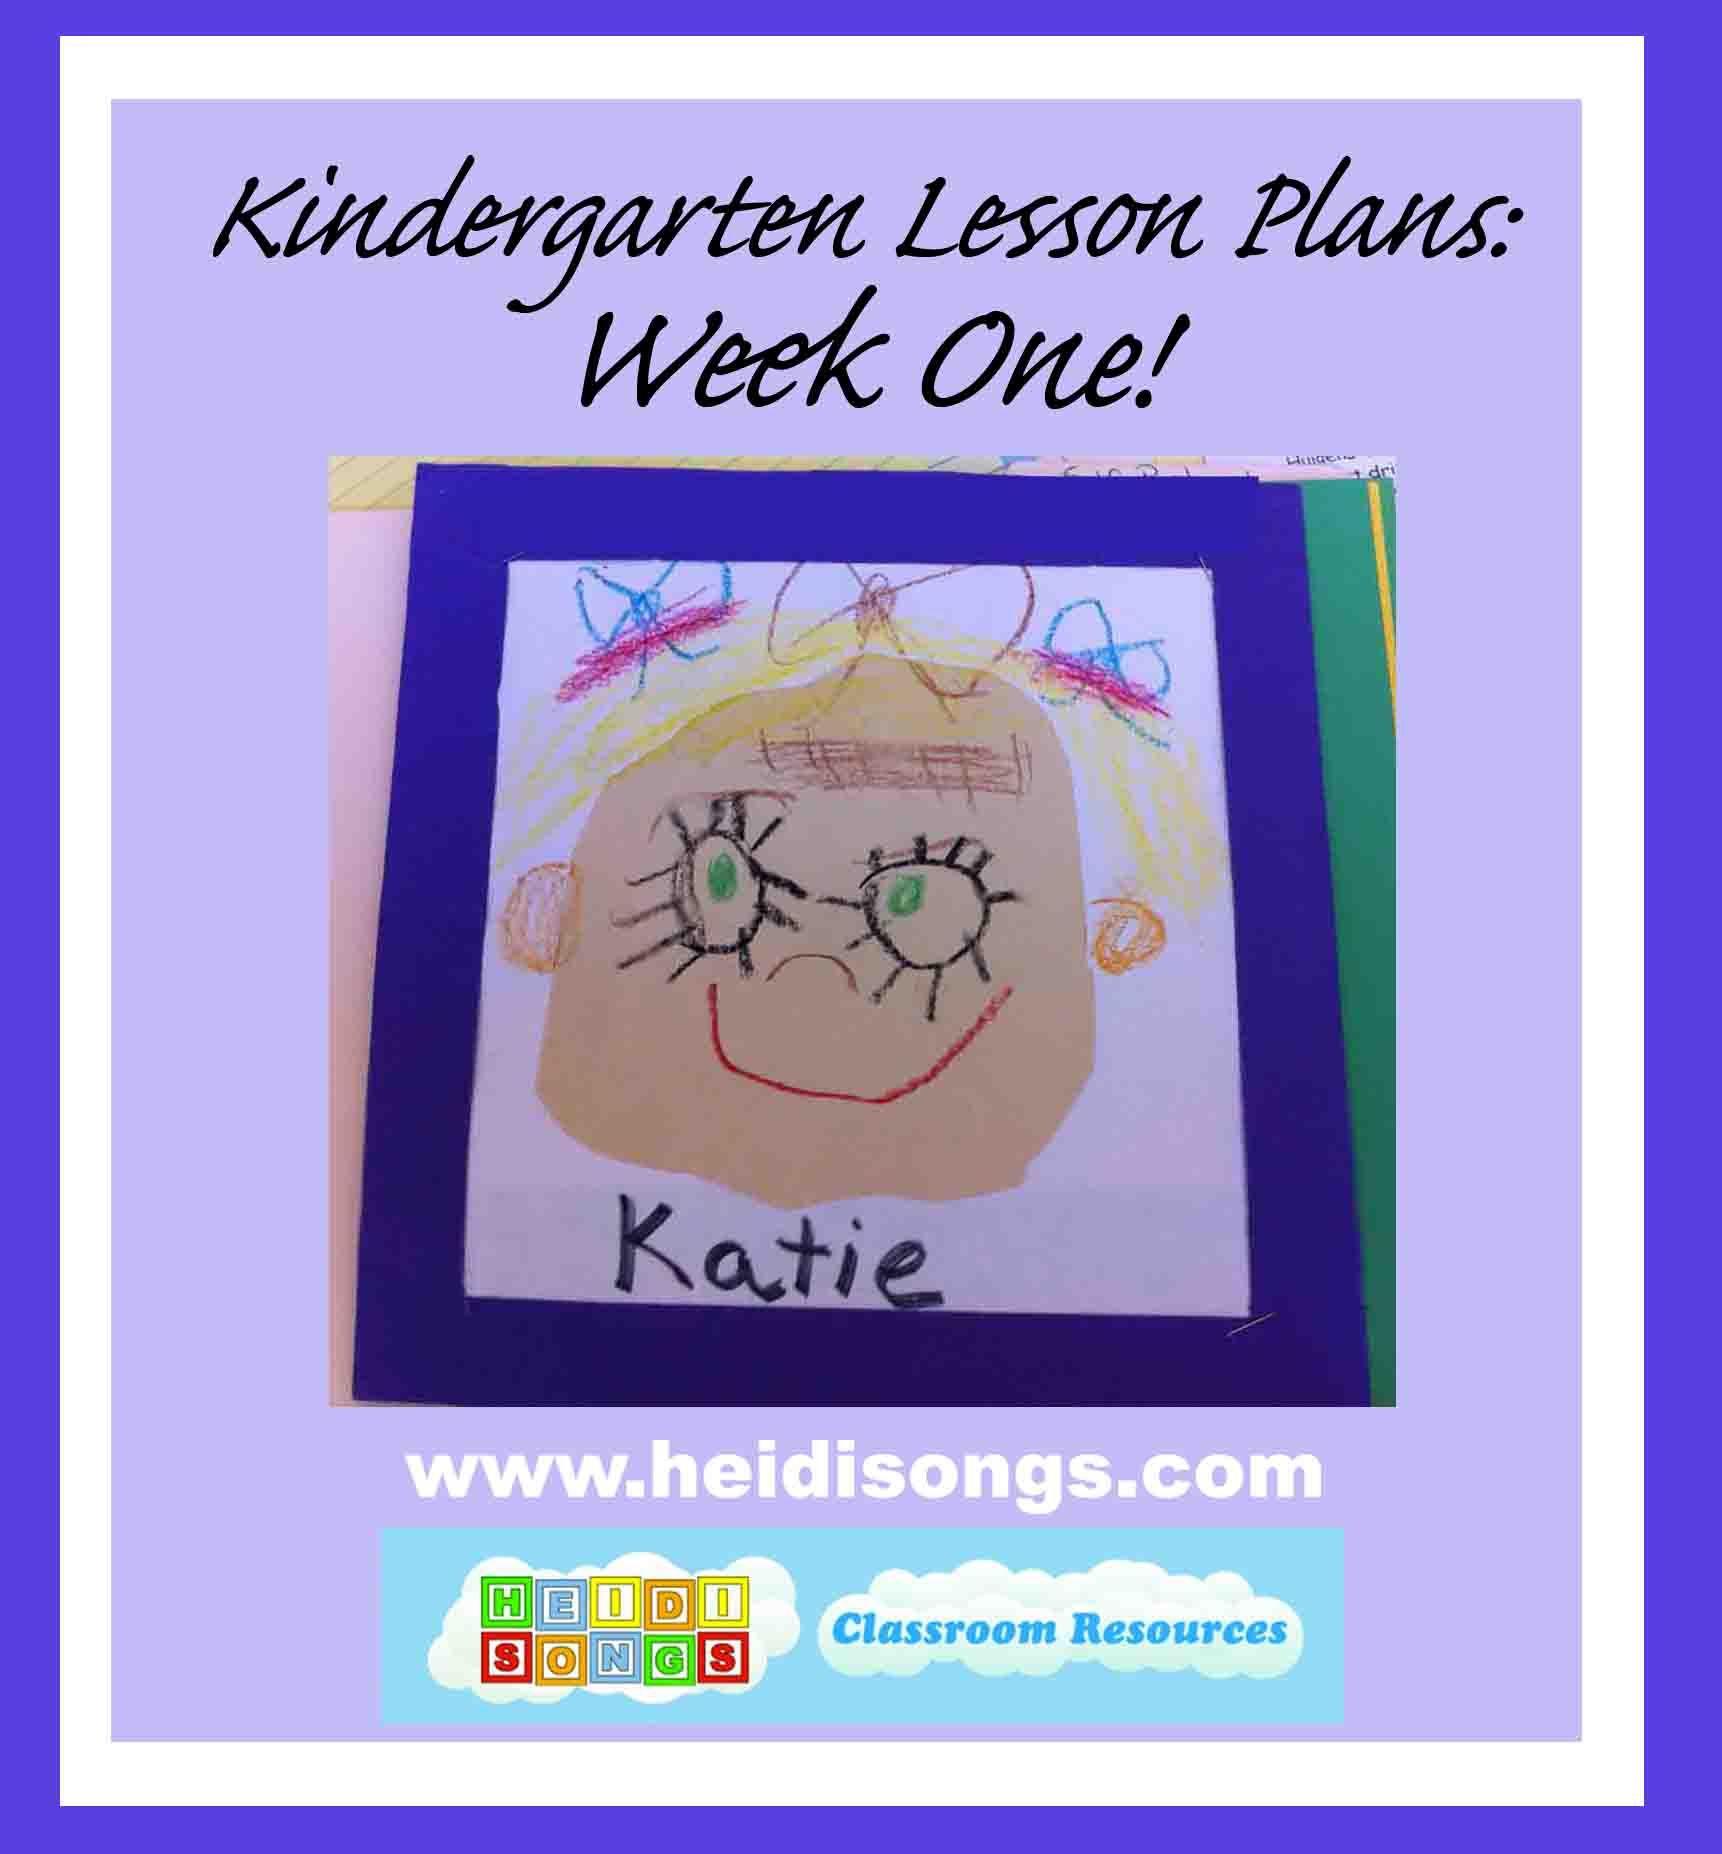 Kindergarten Lesson Plans Week 1